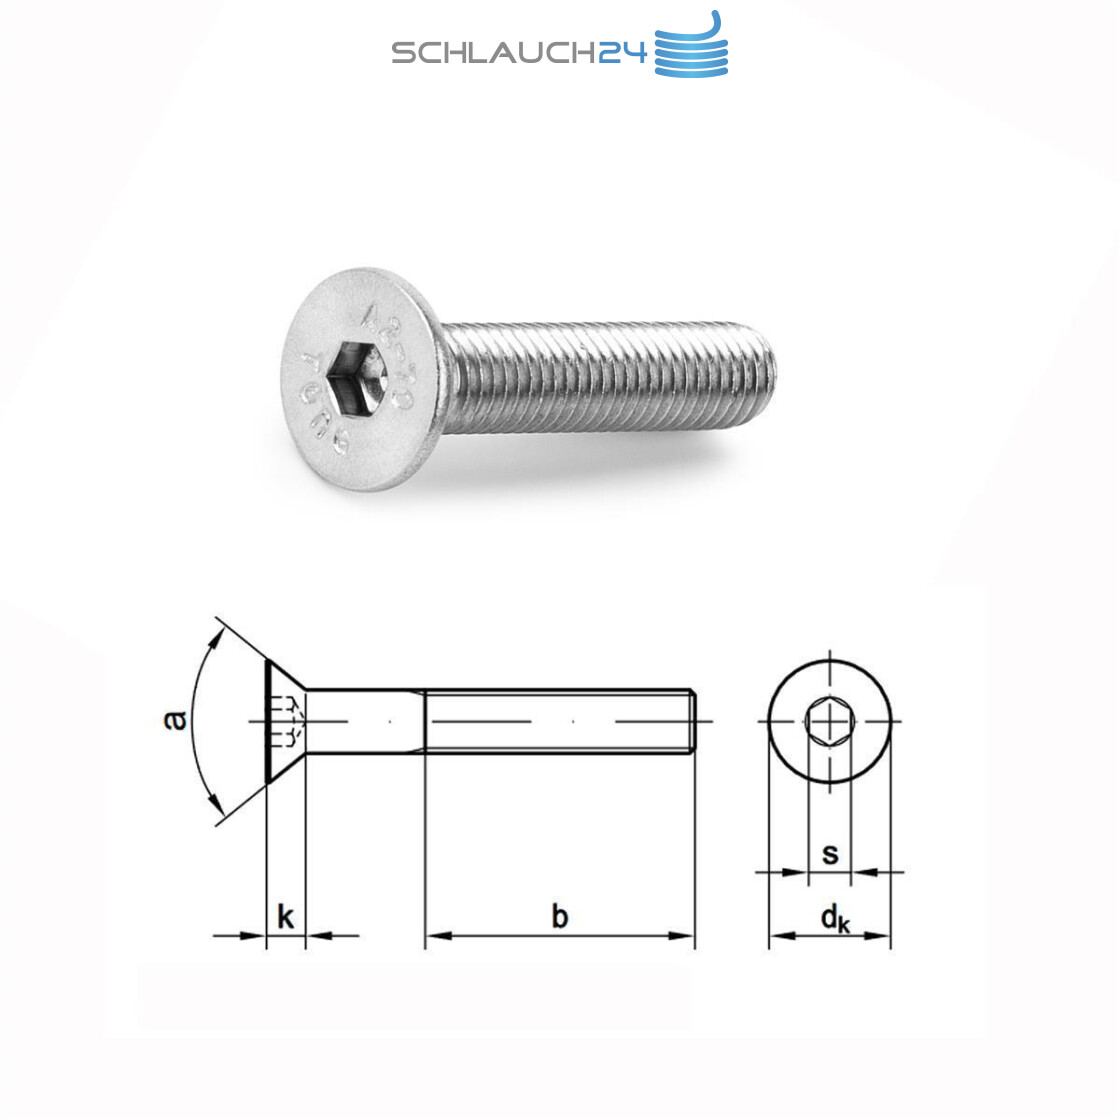 50 Edelstahl V2A Innensechskant Senkkopfschrauben ISO 10642 A2 M12x70